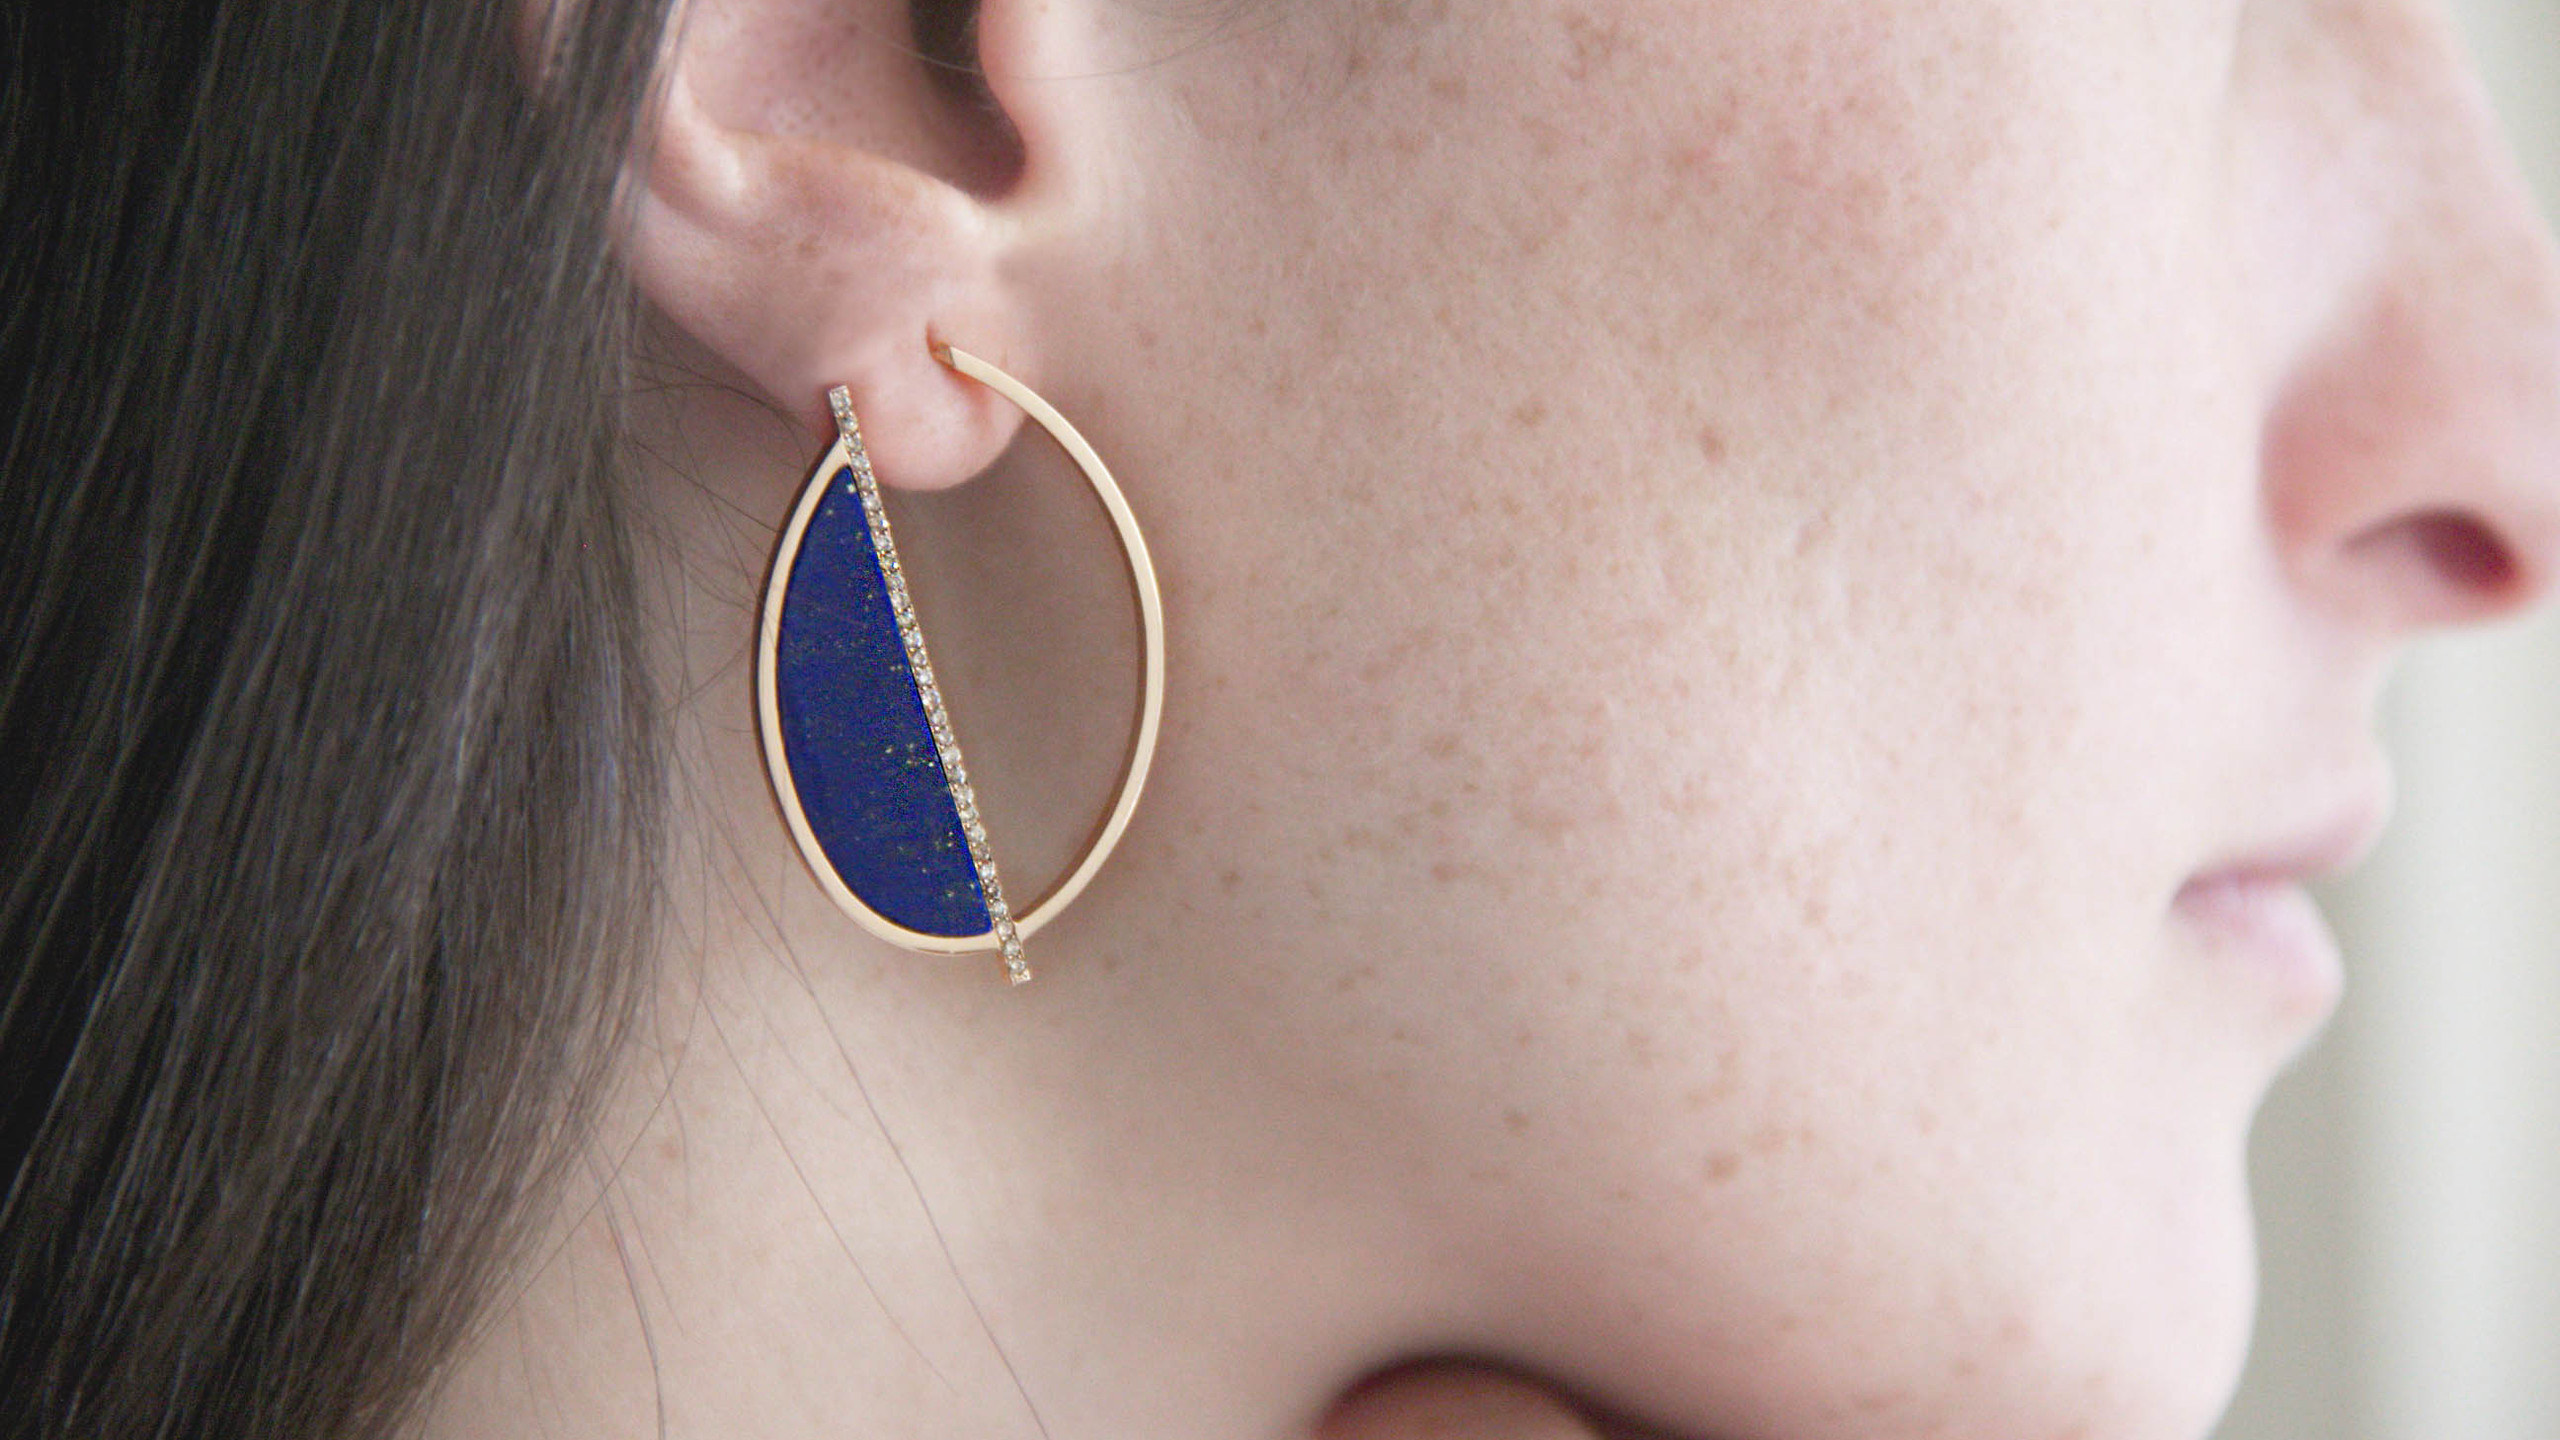 Cerne earrings